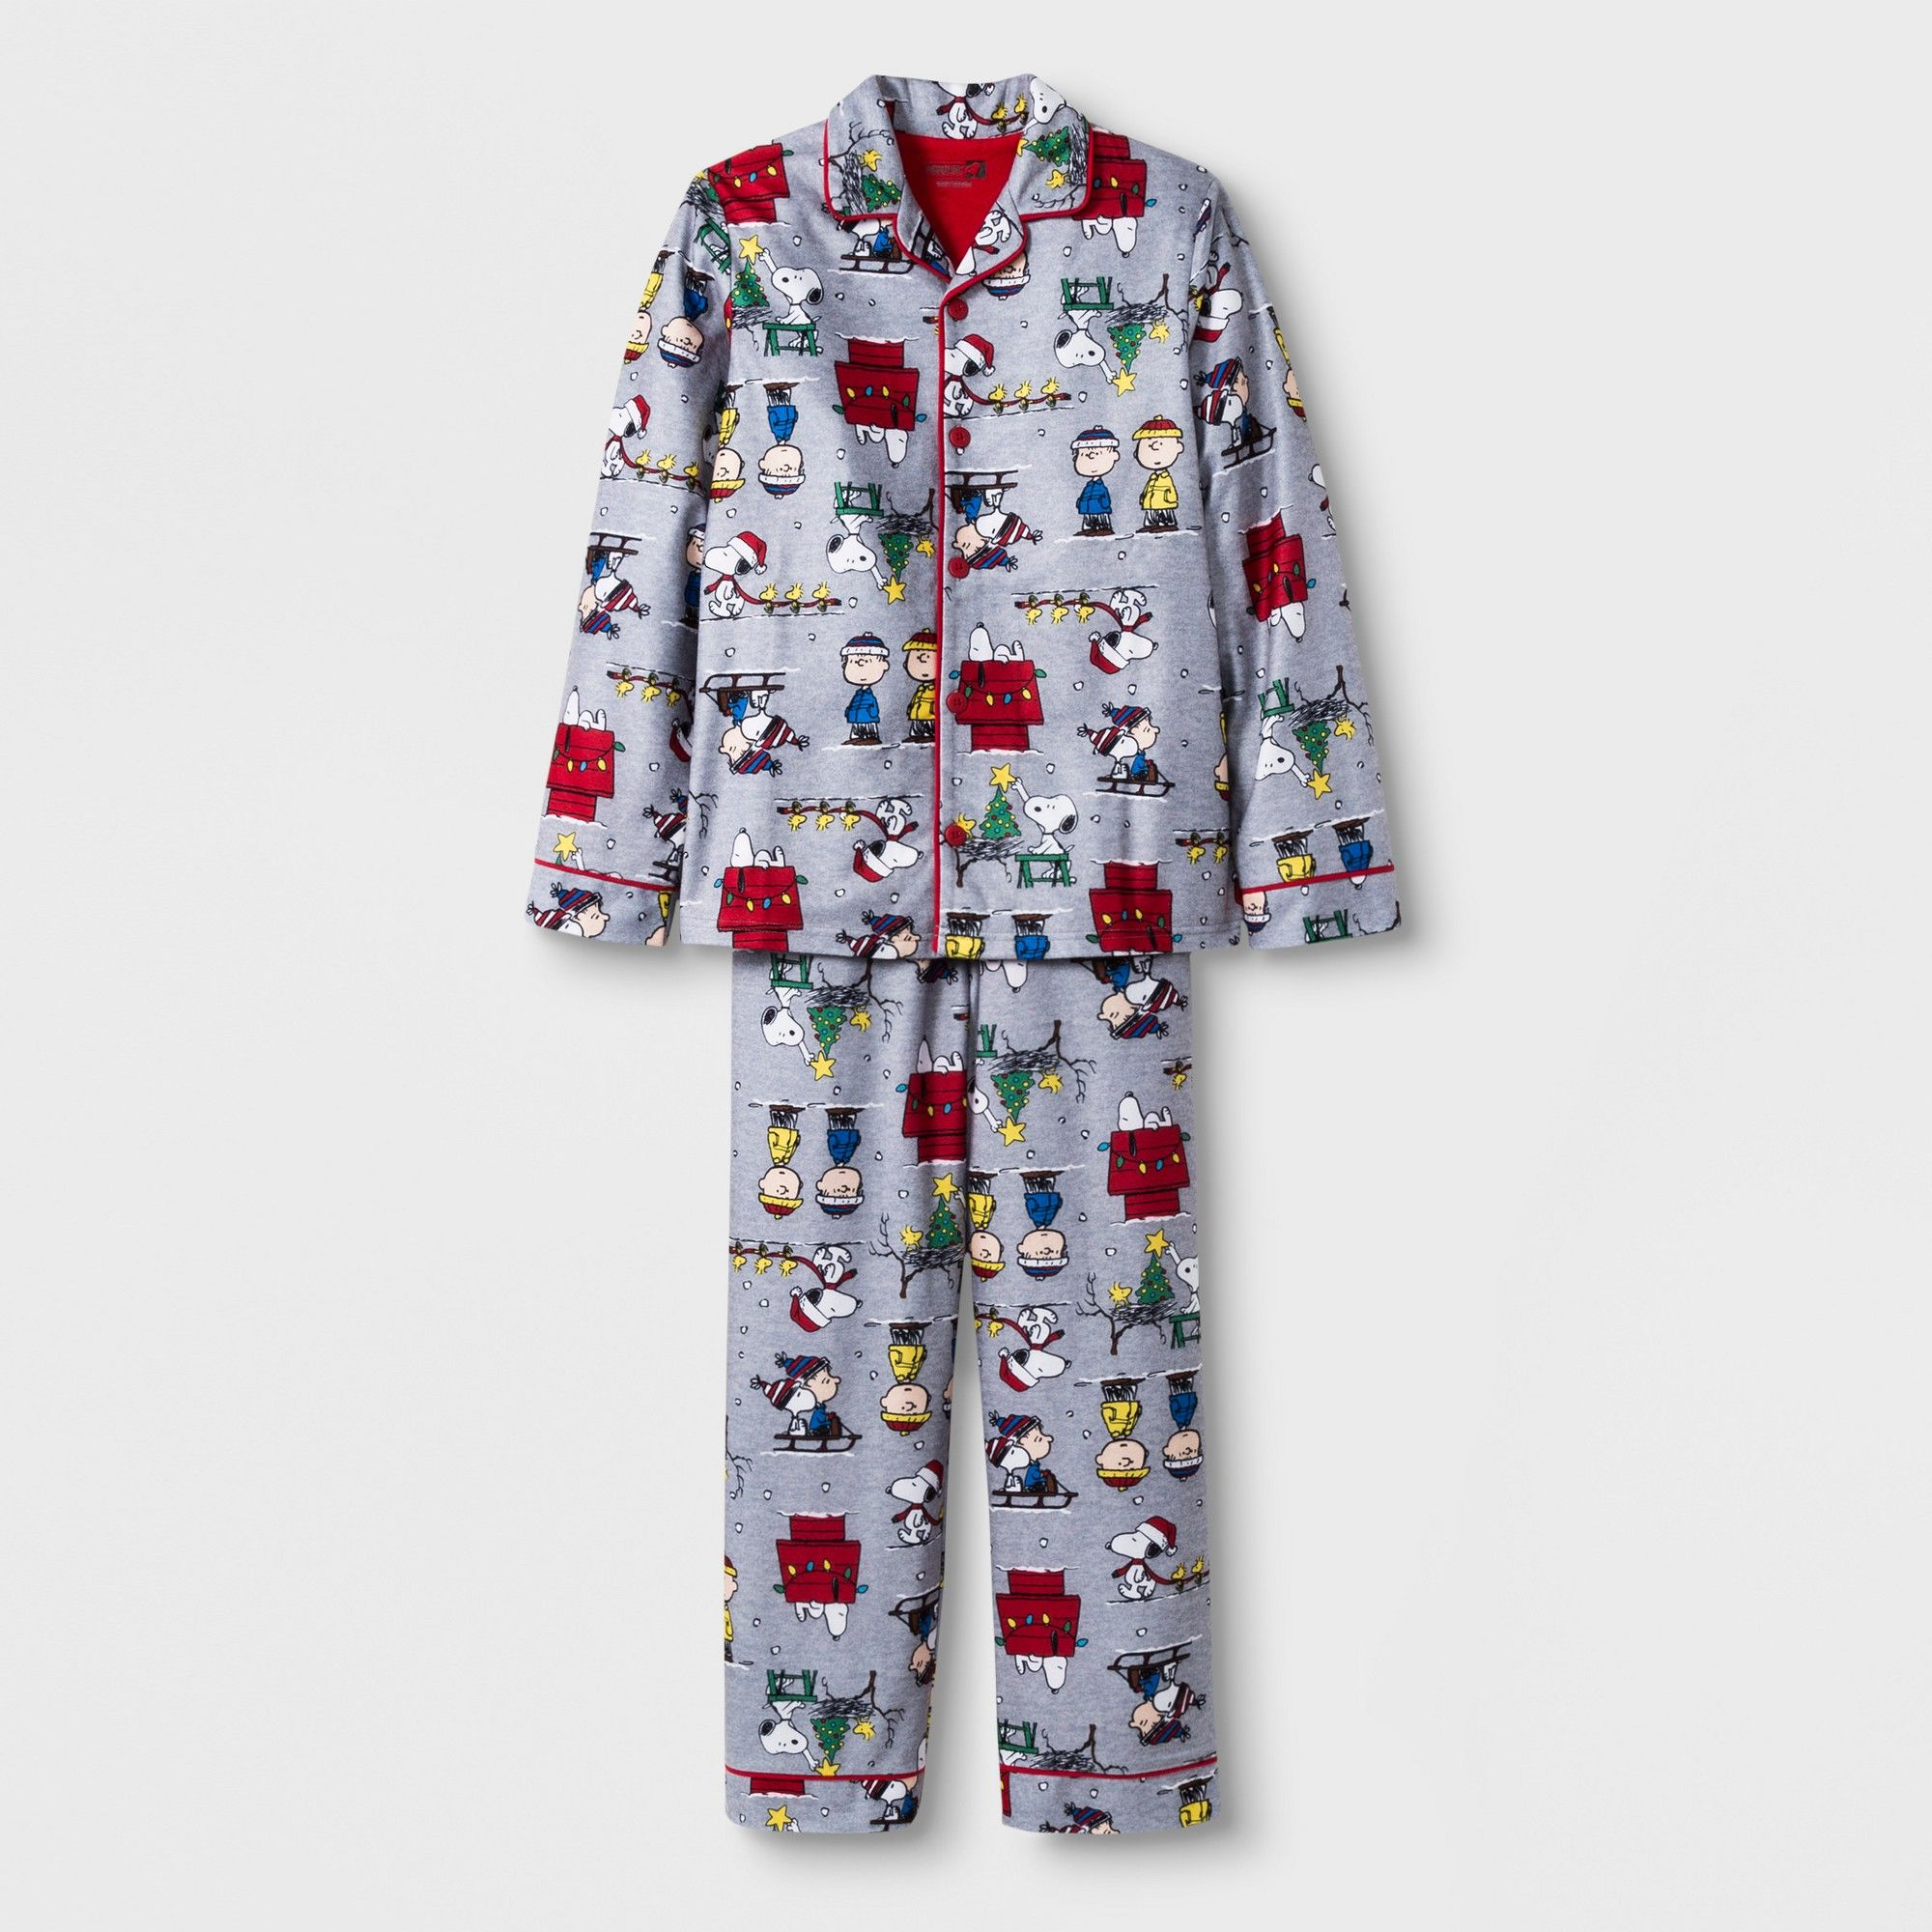 d1af30b8f4 Boys  Peanuts 2pc Pajama Set - Gray S in 2018